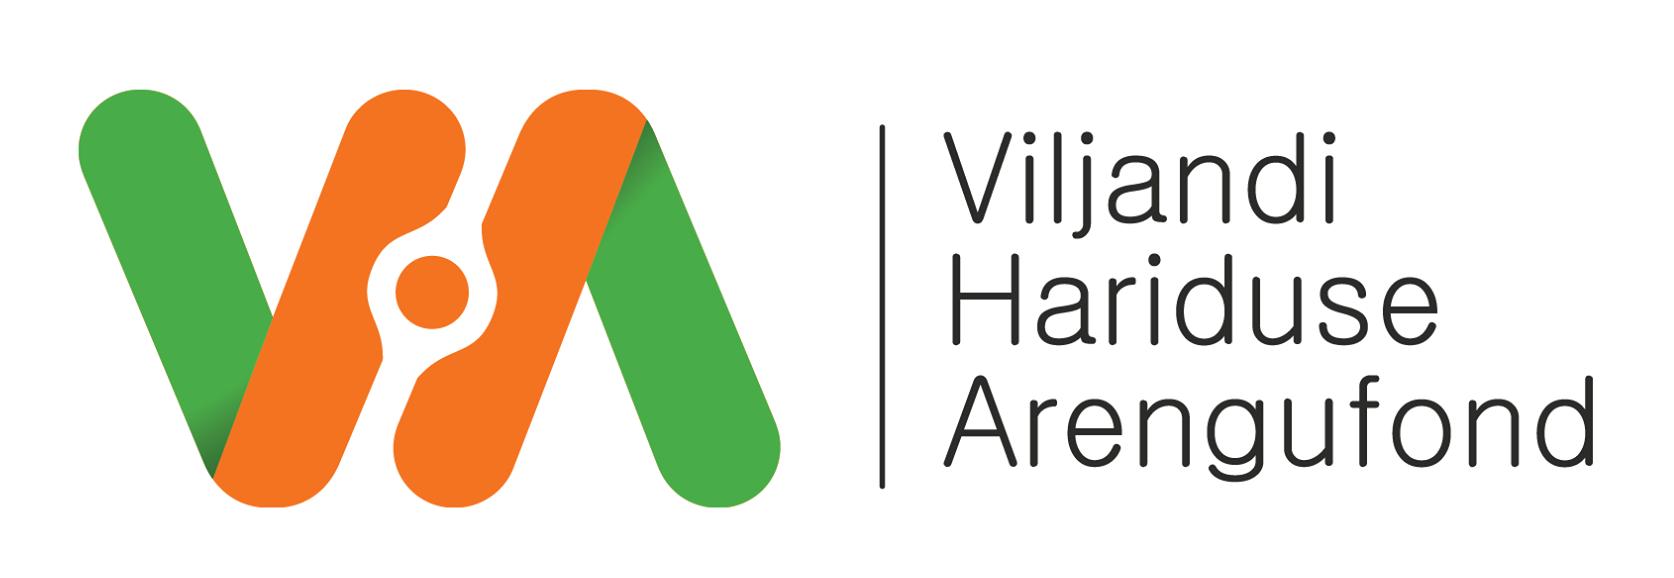 Viljandi hariduse arengufond logo